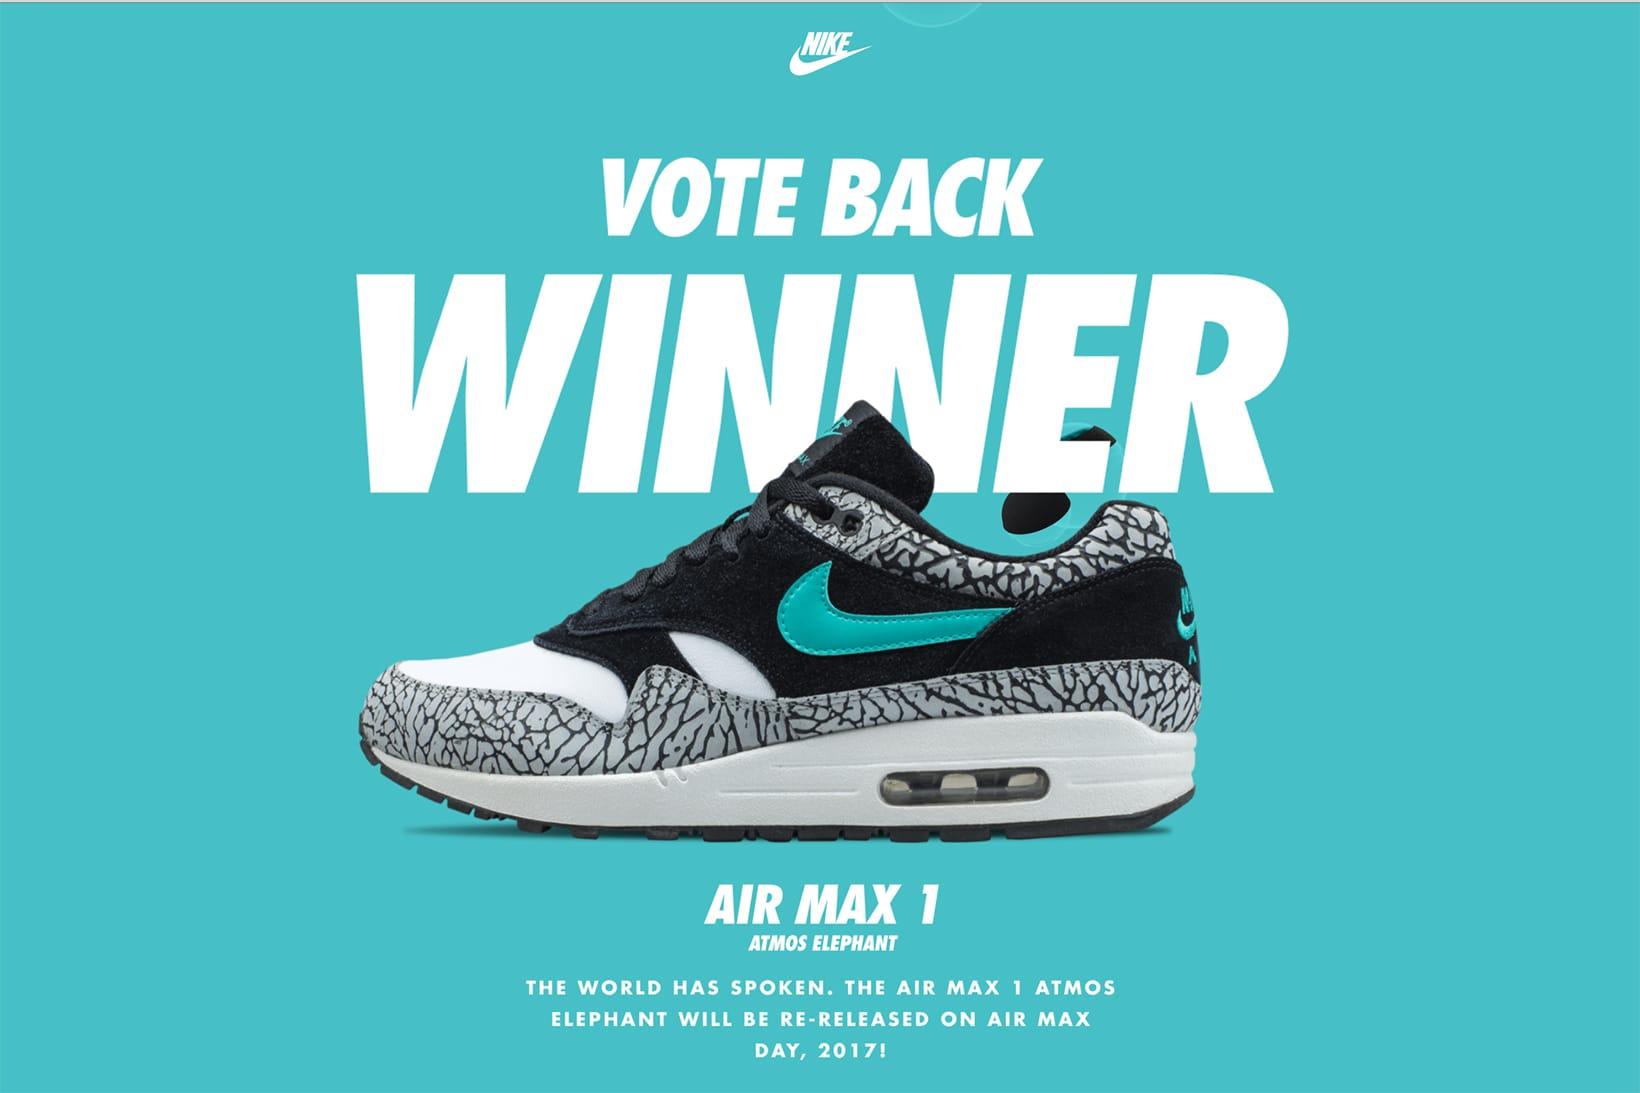 atmos x nike air max 1 elephant wins vote back hypebeast rh hypebeast com